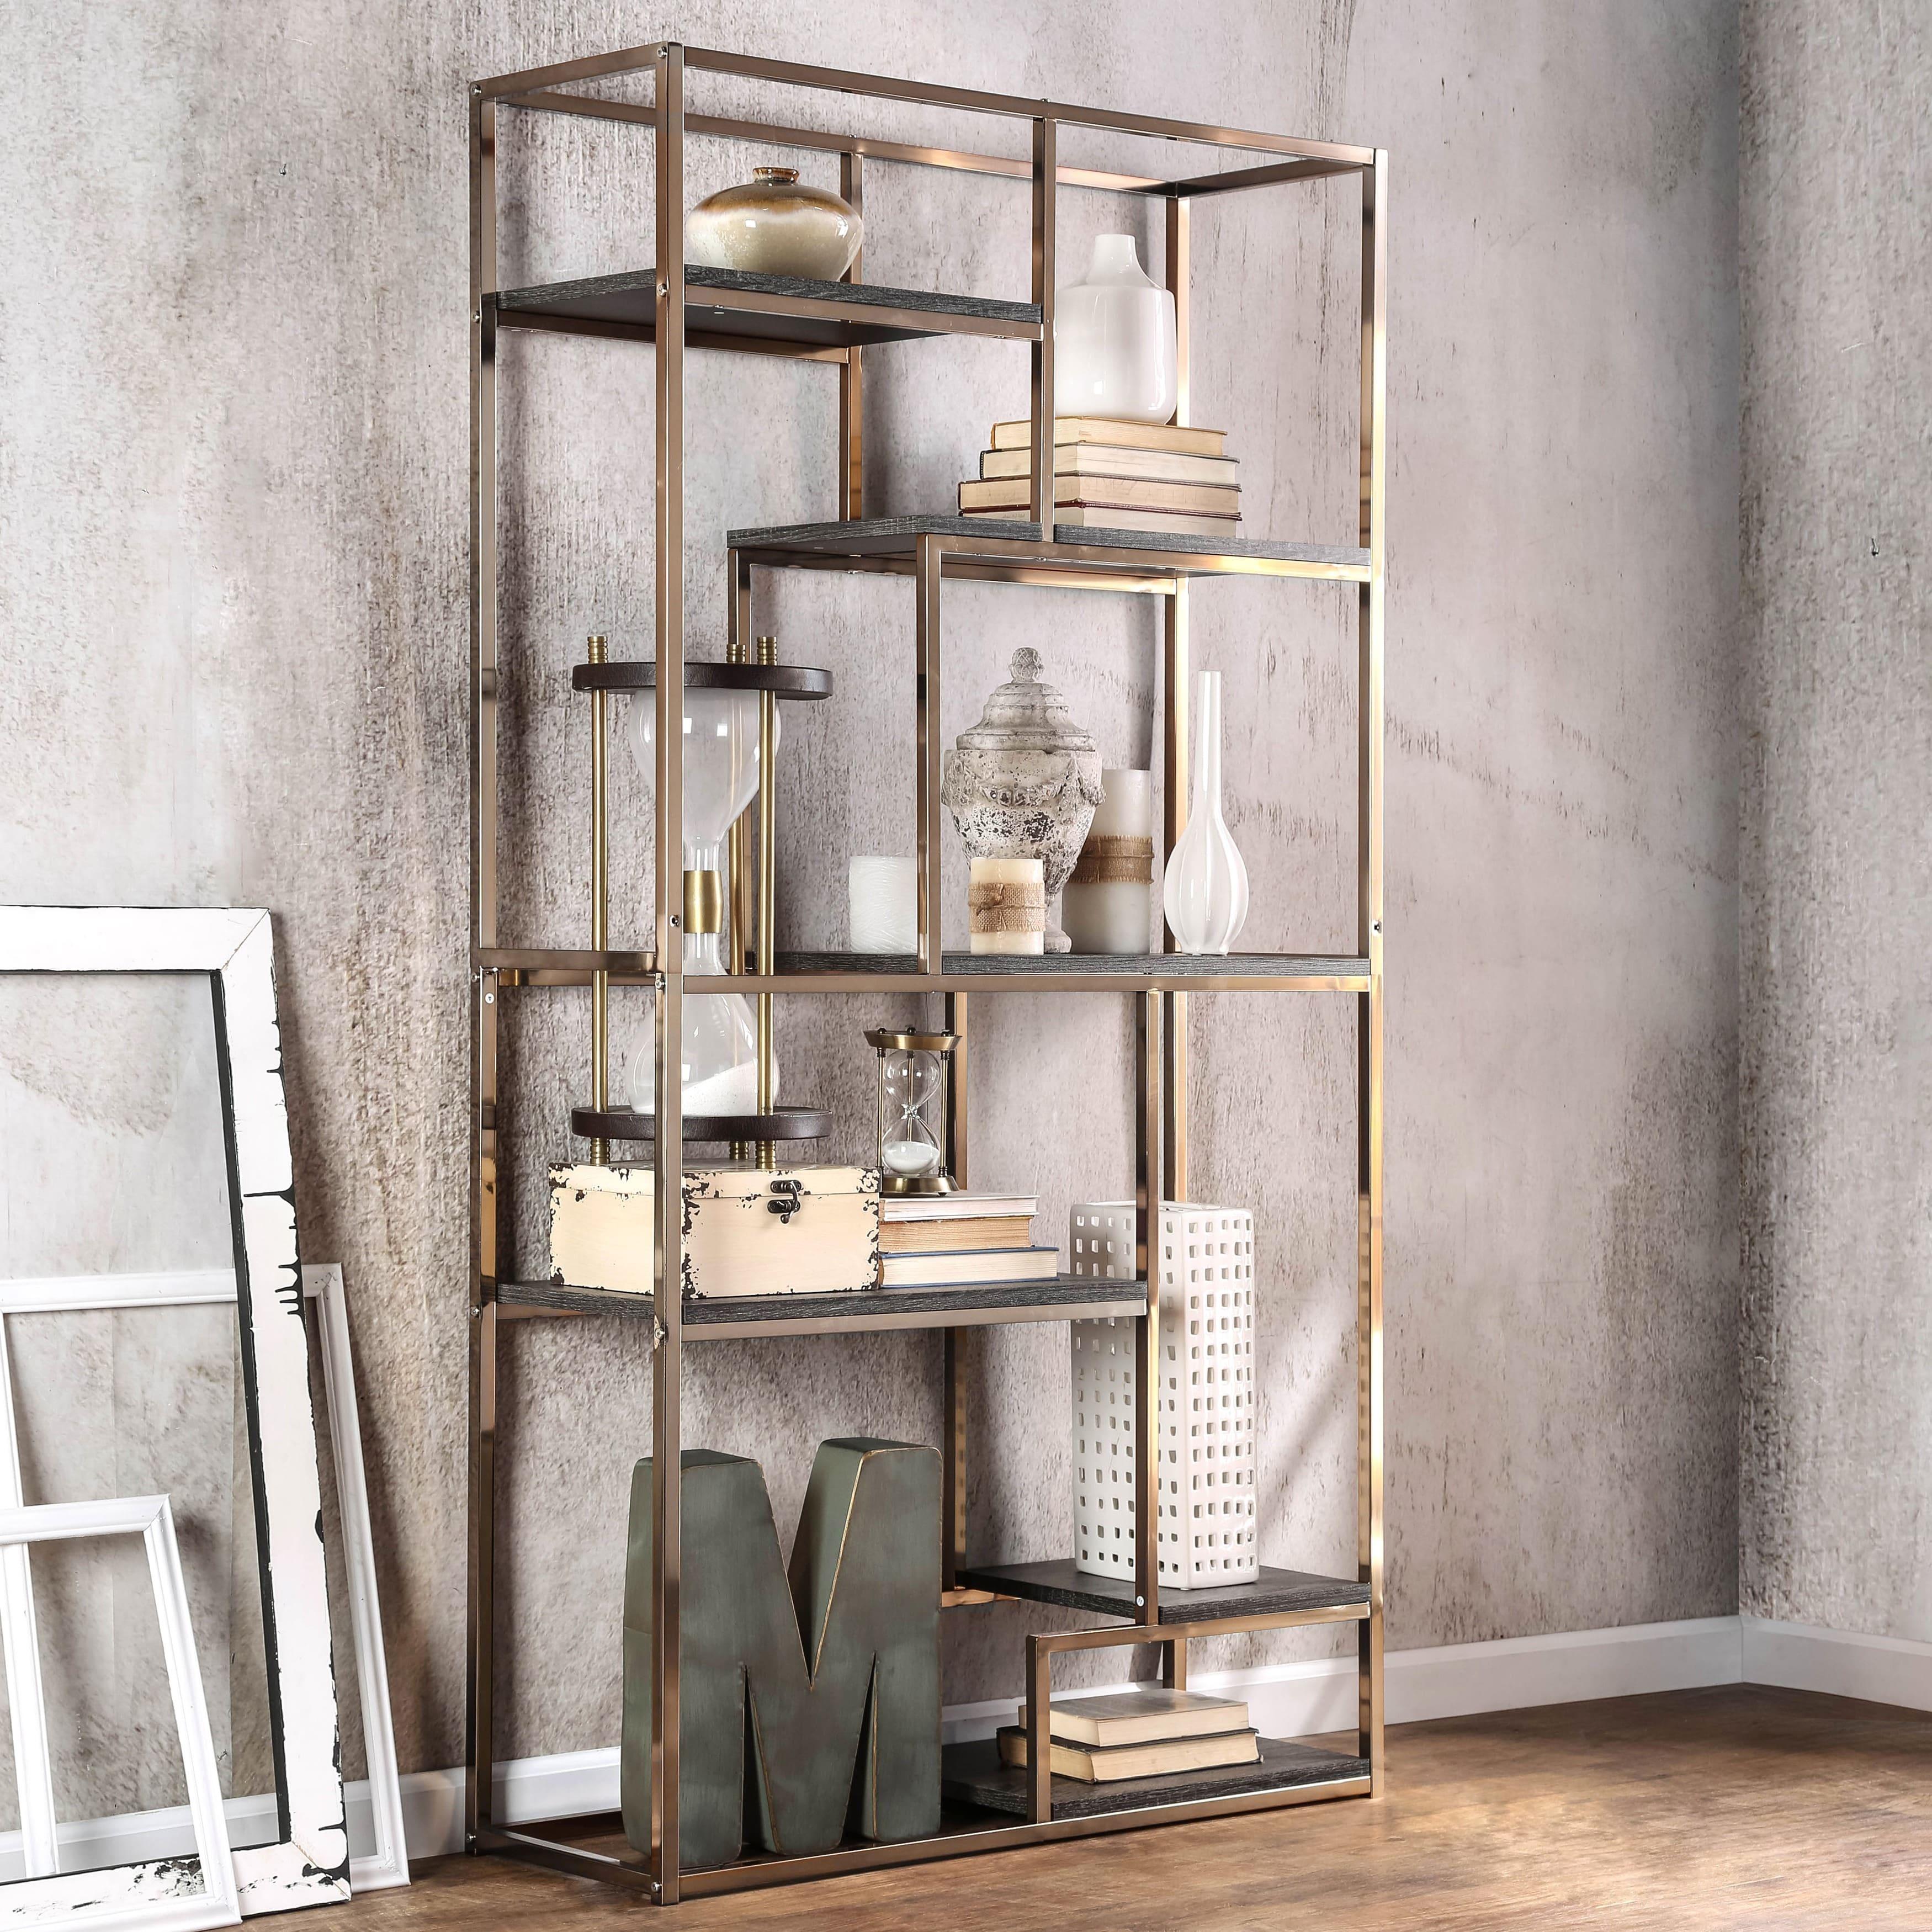 Best Furniture Deals Online: Buy Bookshelves & Bookcases Online At Overstock